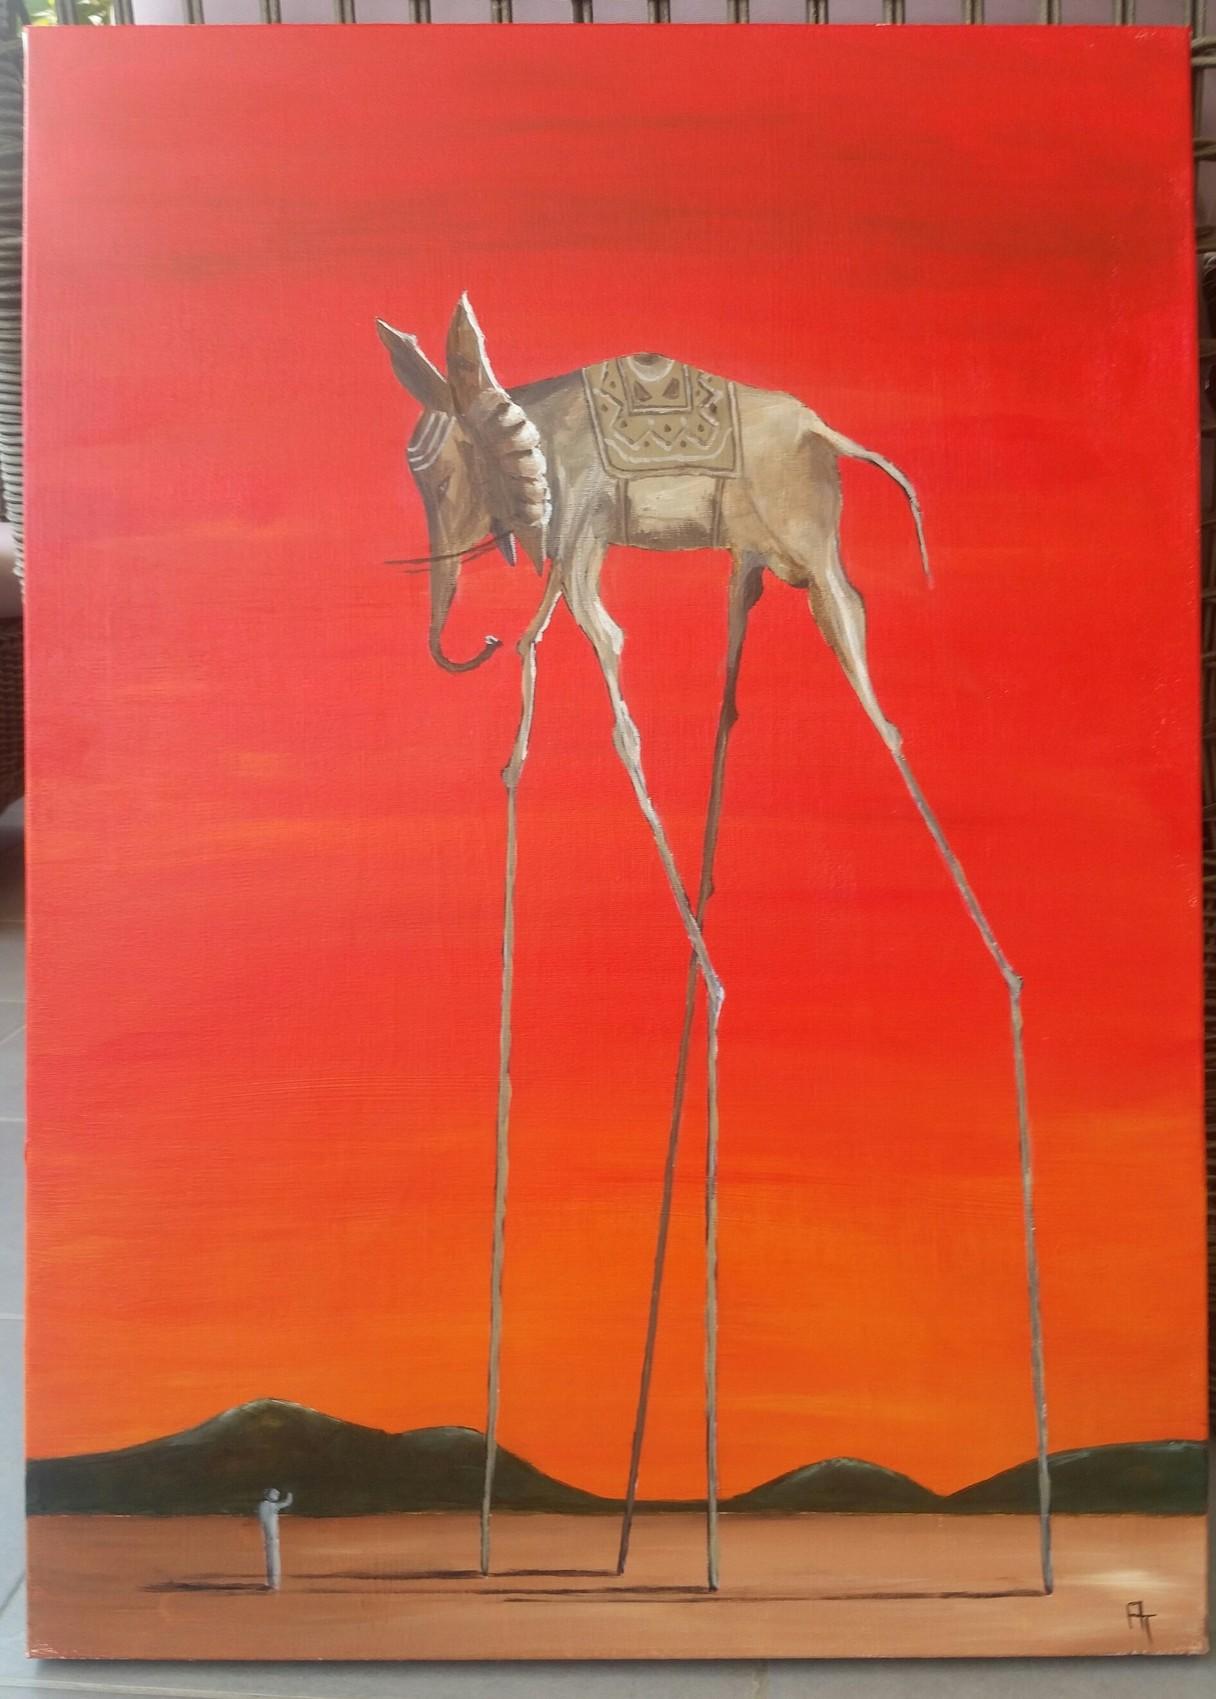 d61c2c30c41 Peinture Elephant de Dali